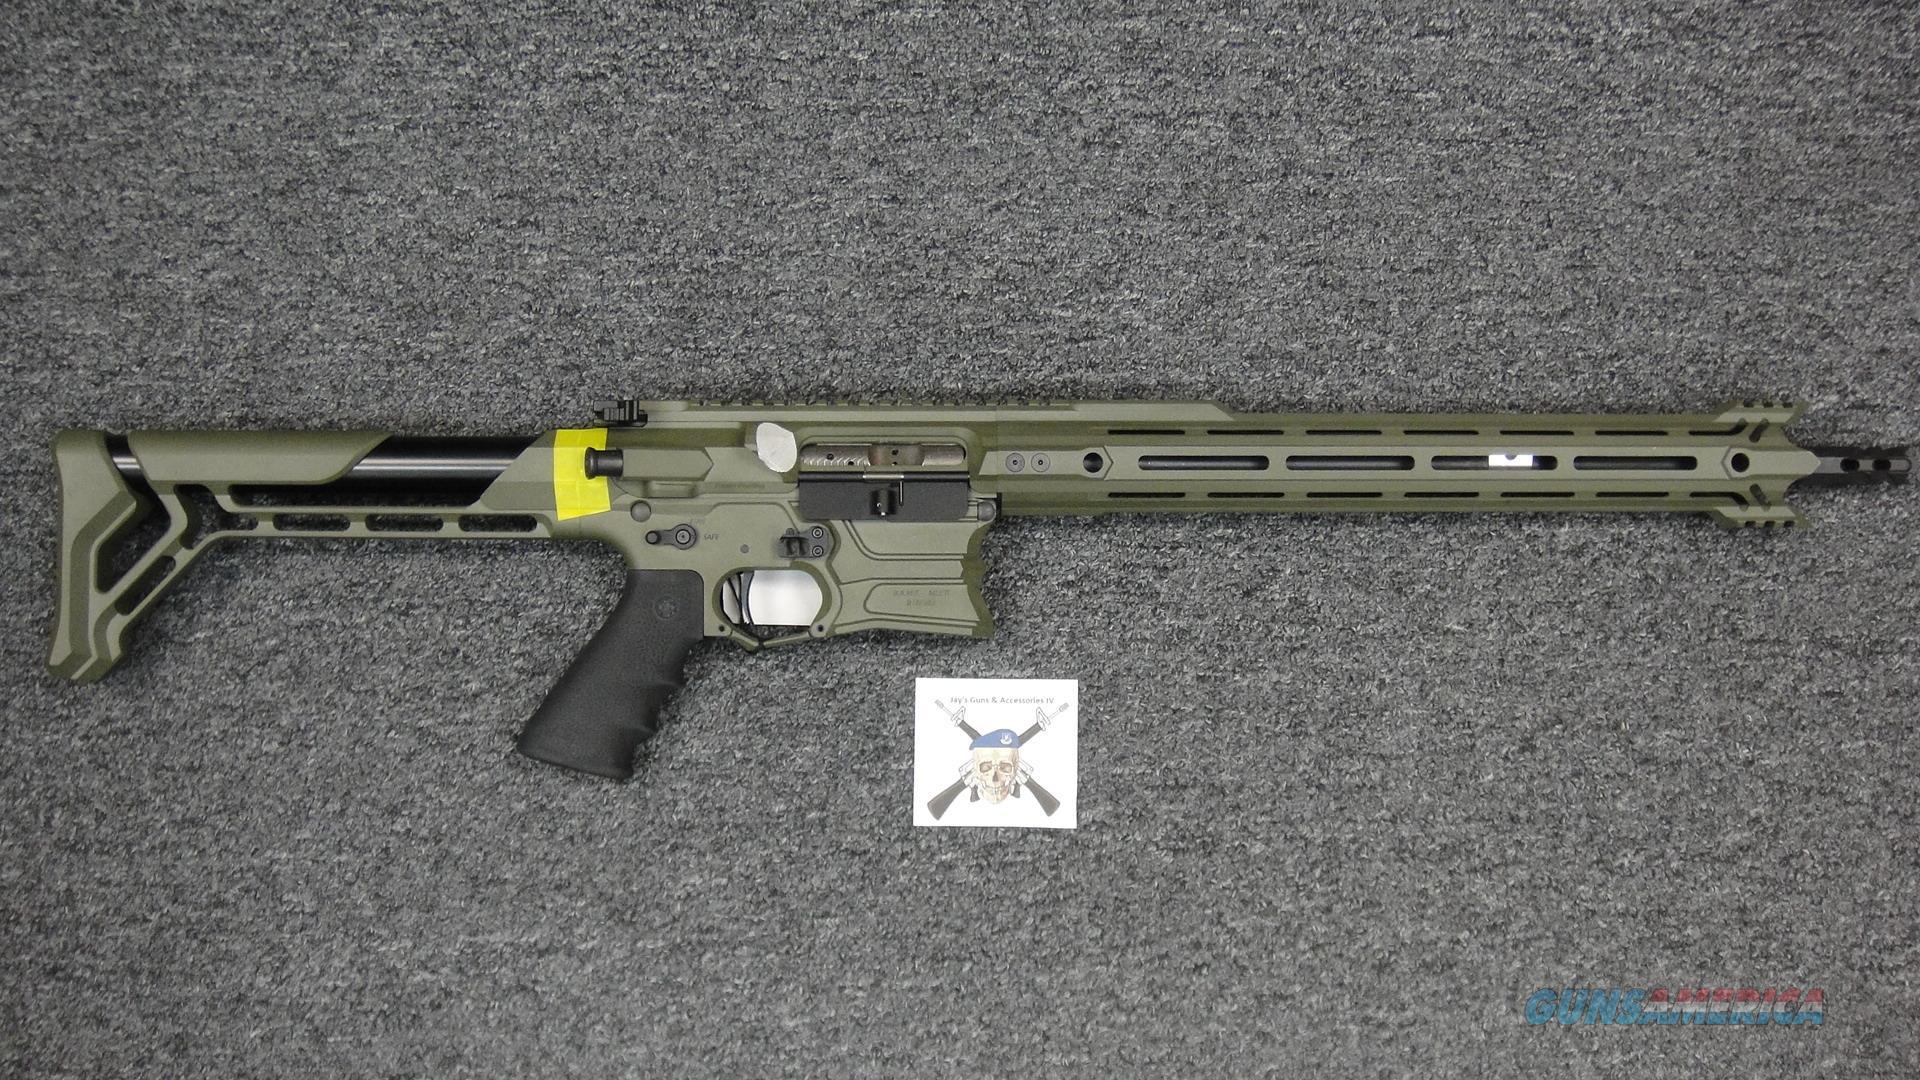 Cobalt Kinetics EDGE Green/Black  Guns > Rifles > AR-15 Rifles - Small Manufacturers > Complete Rifle